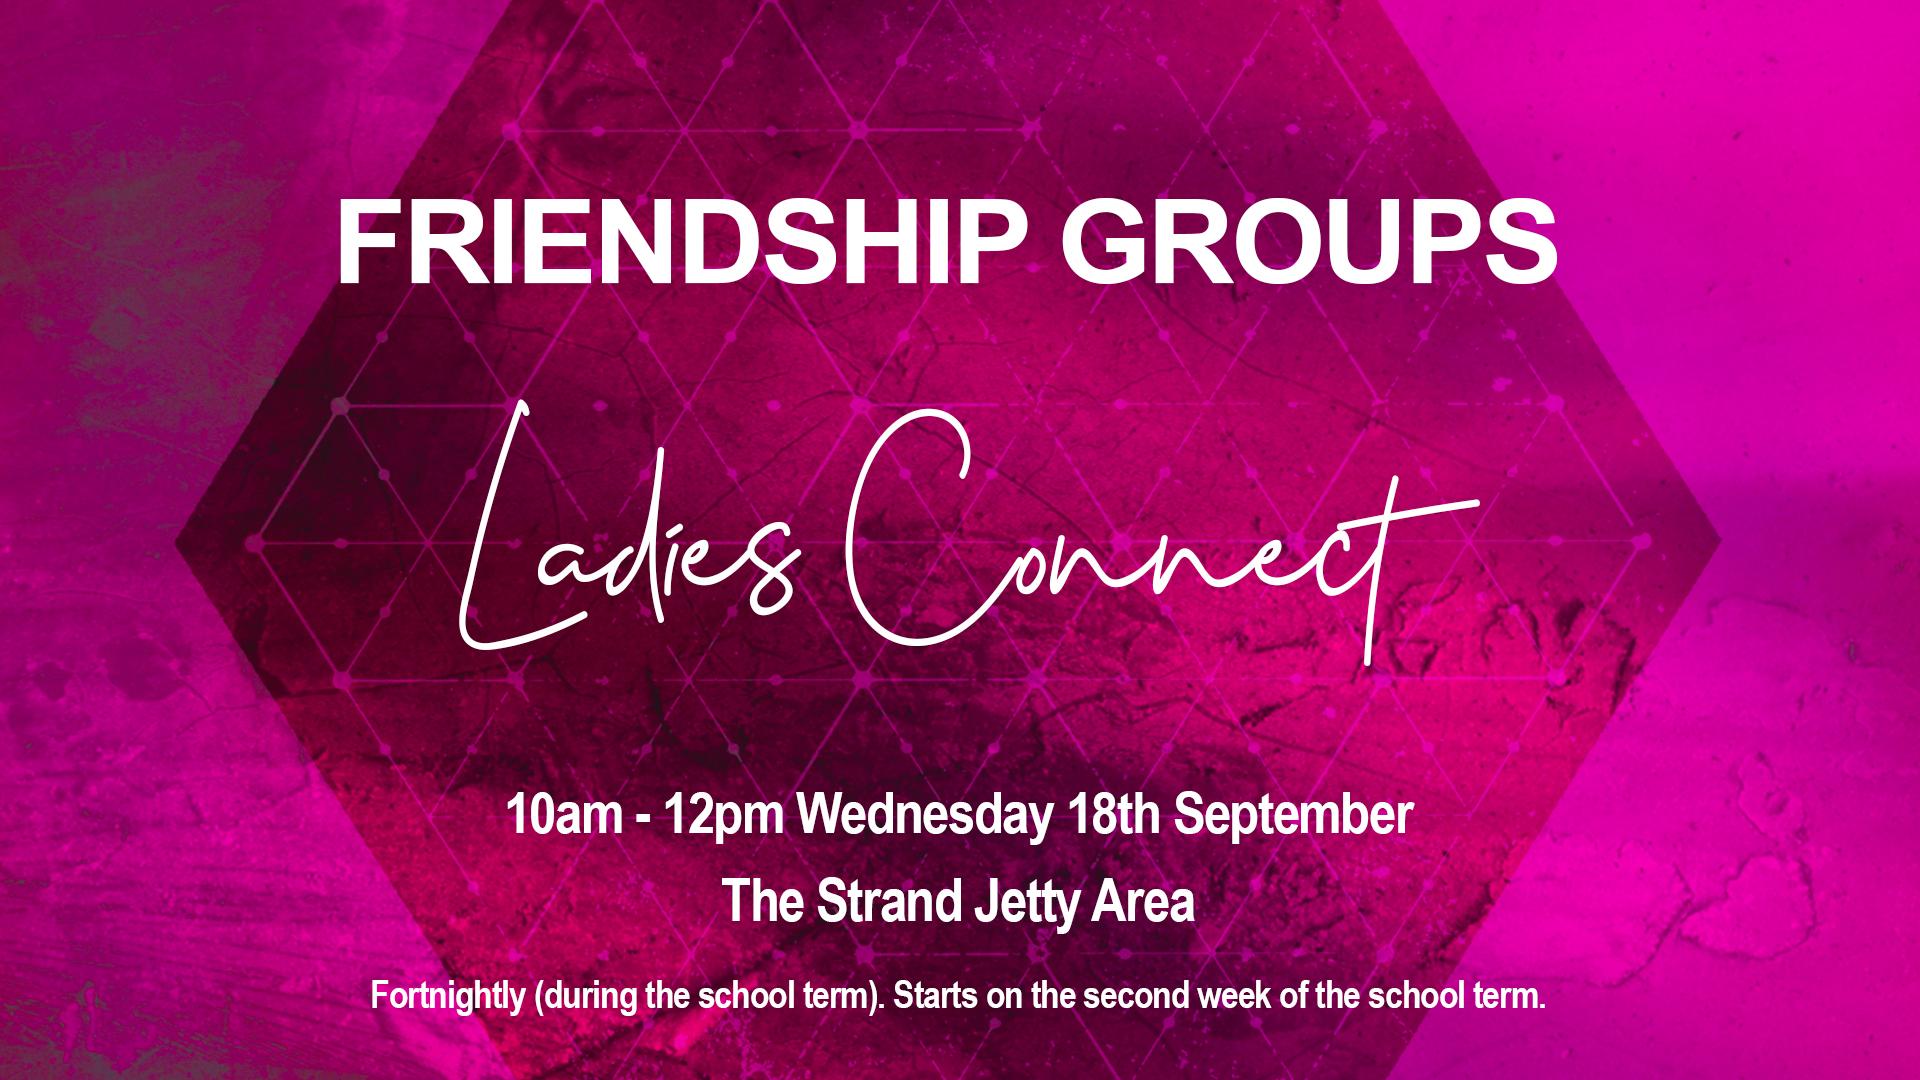 Ladies-connect-foyer-18th-sept.jpg